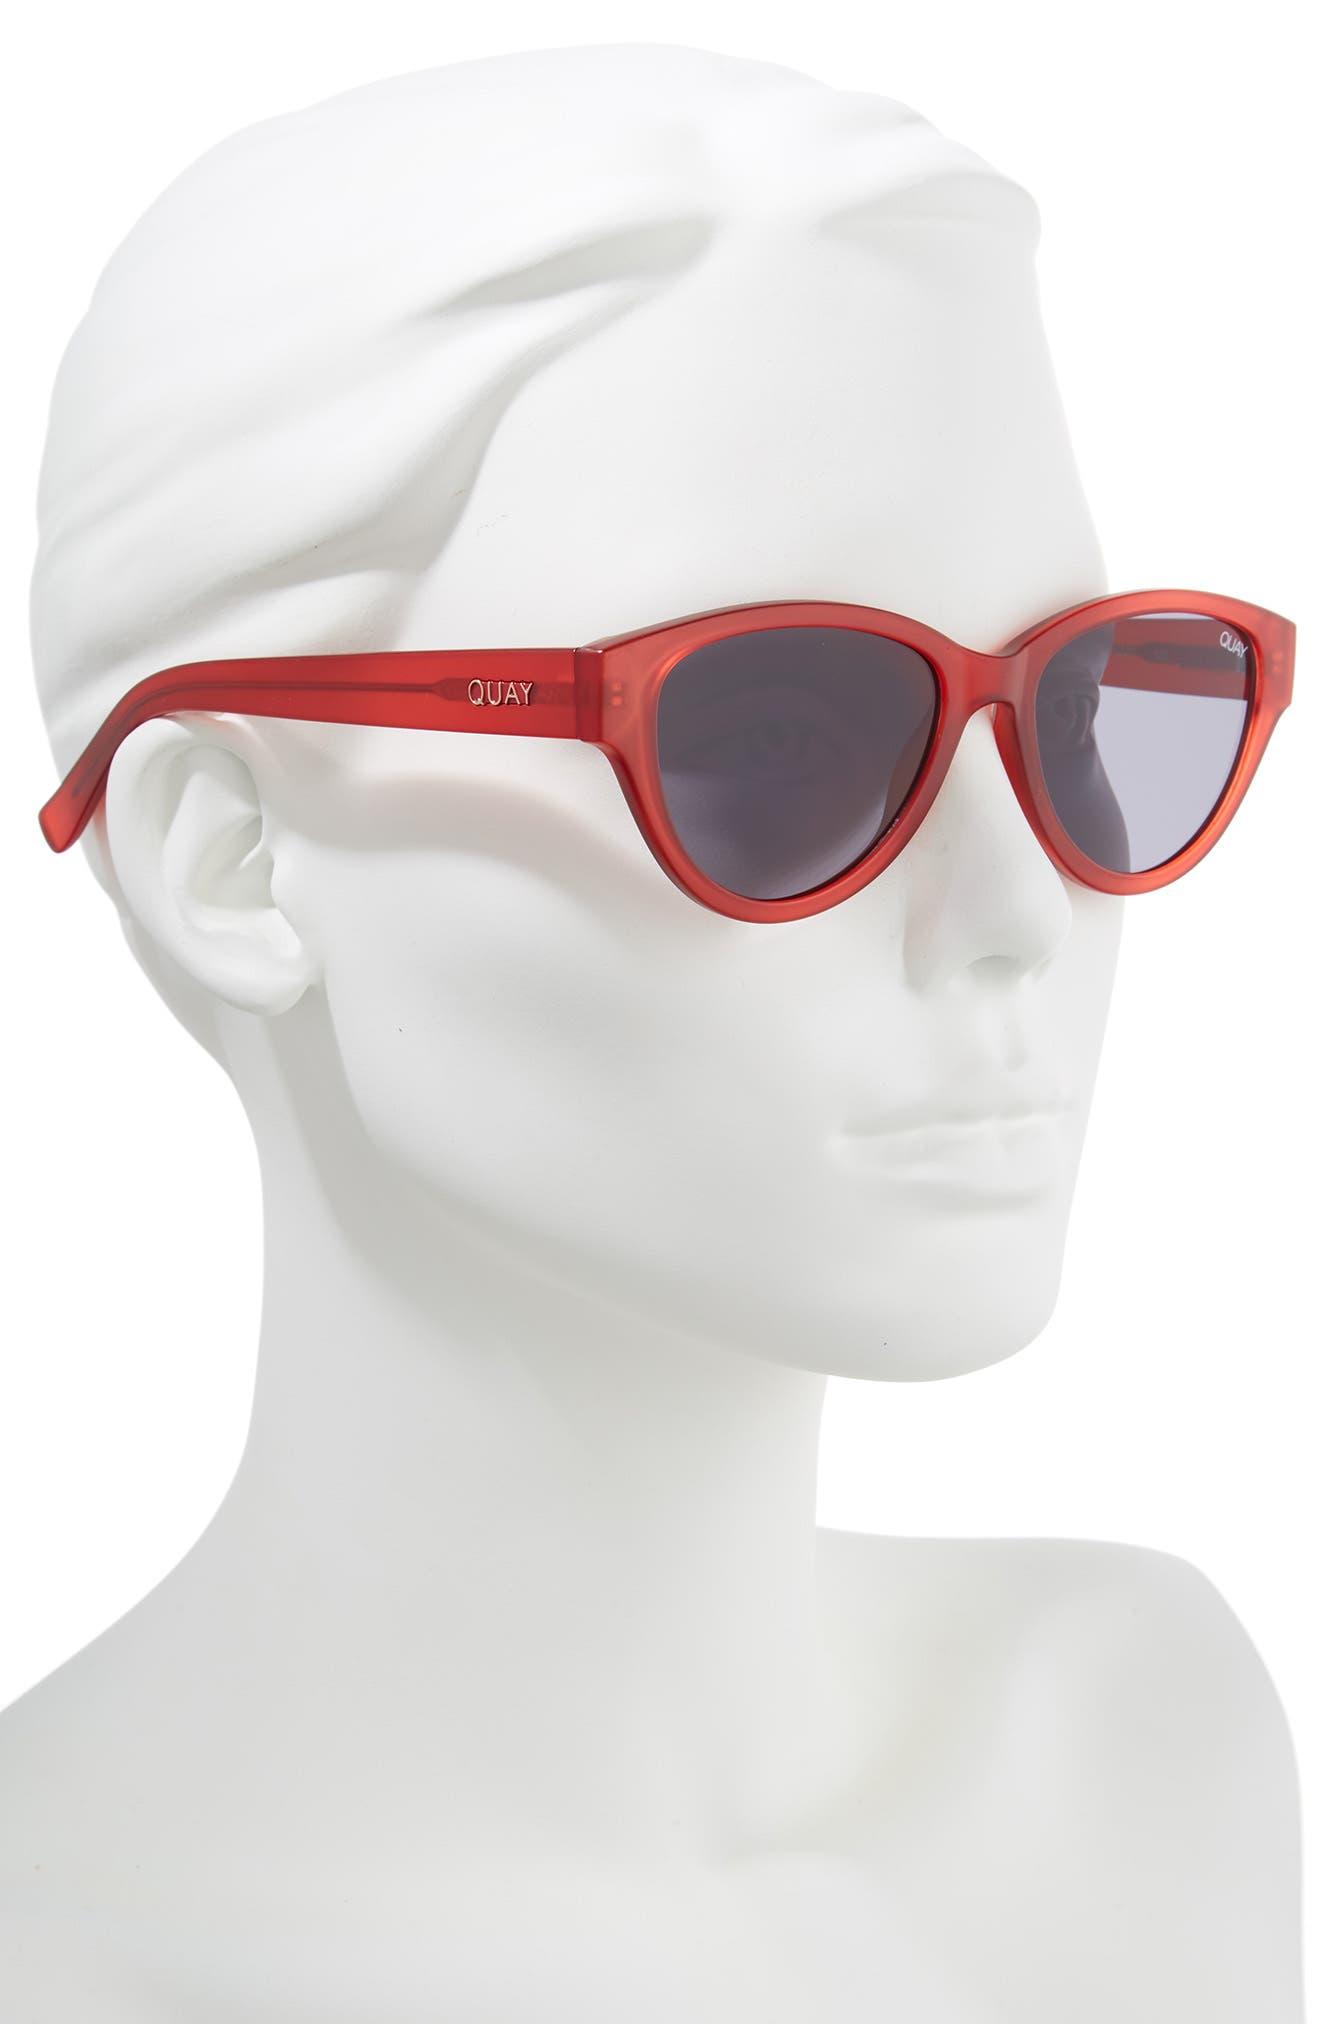 Rizzo 55mm Cat Eye Sunglasses,                             Alternate thumbnail 3, color,                             Red/ Smoke